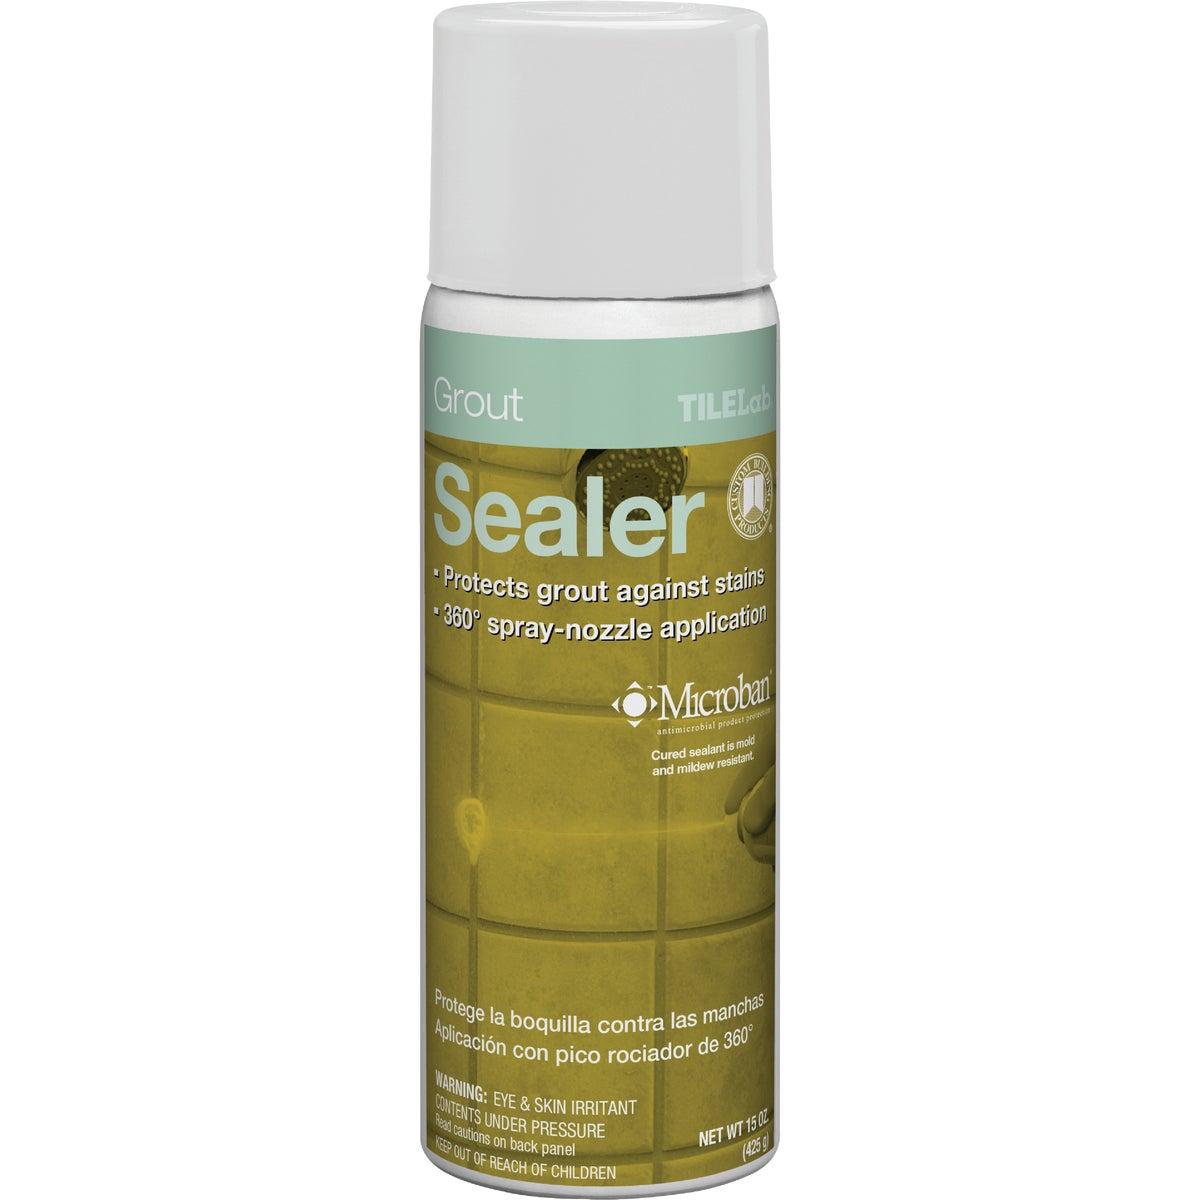 15Oz Grout Spray Sealer